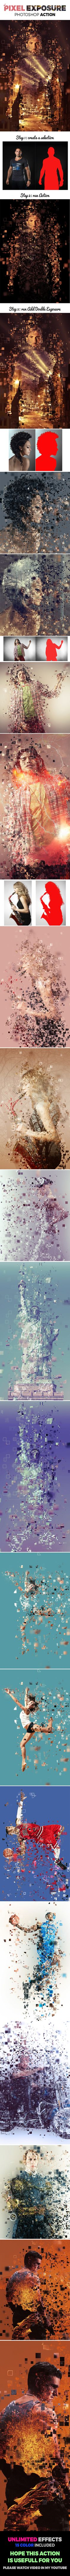 Pixel Exposure Photo Effect Photoshop Action. Download here: http://graphicriver.net/item/pixel-exposure/16009214?ref=ksioks